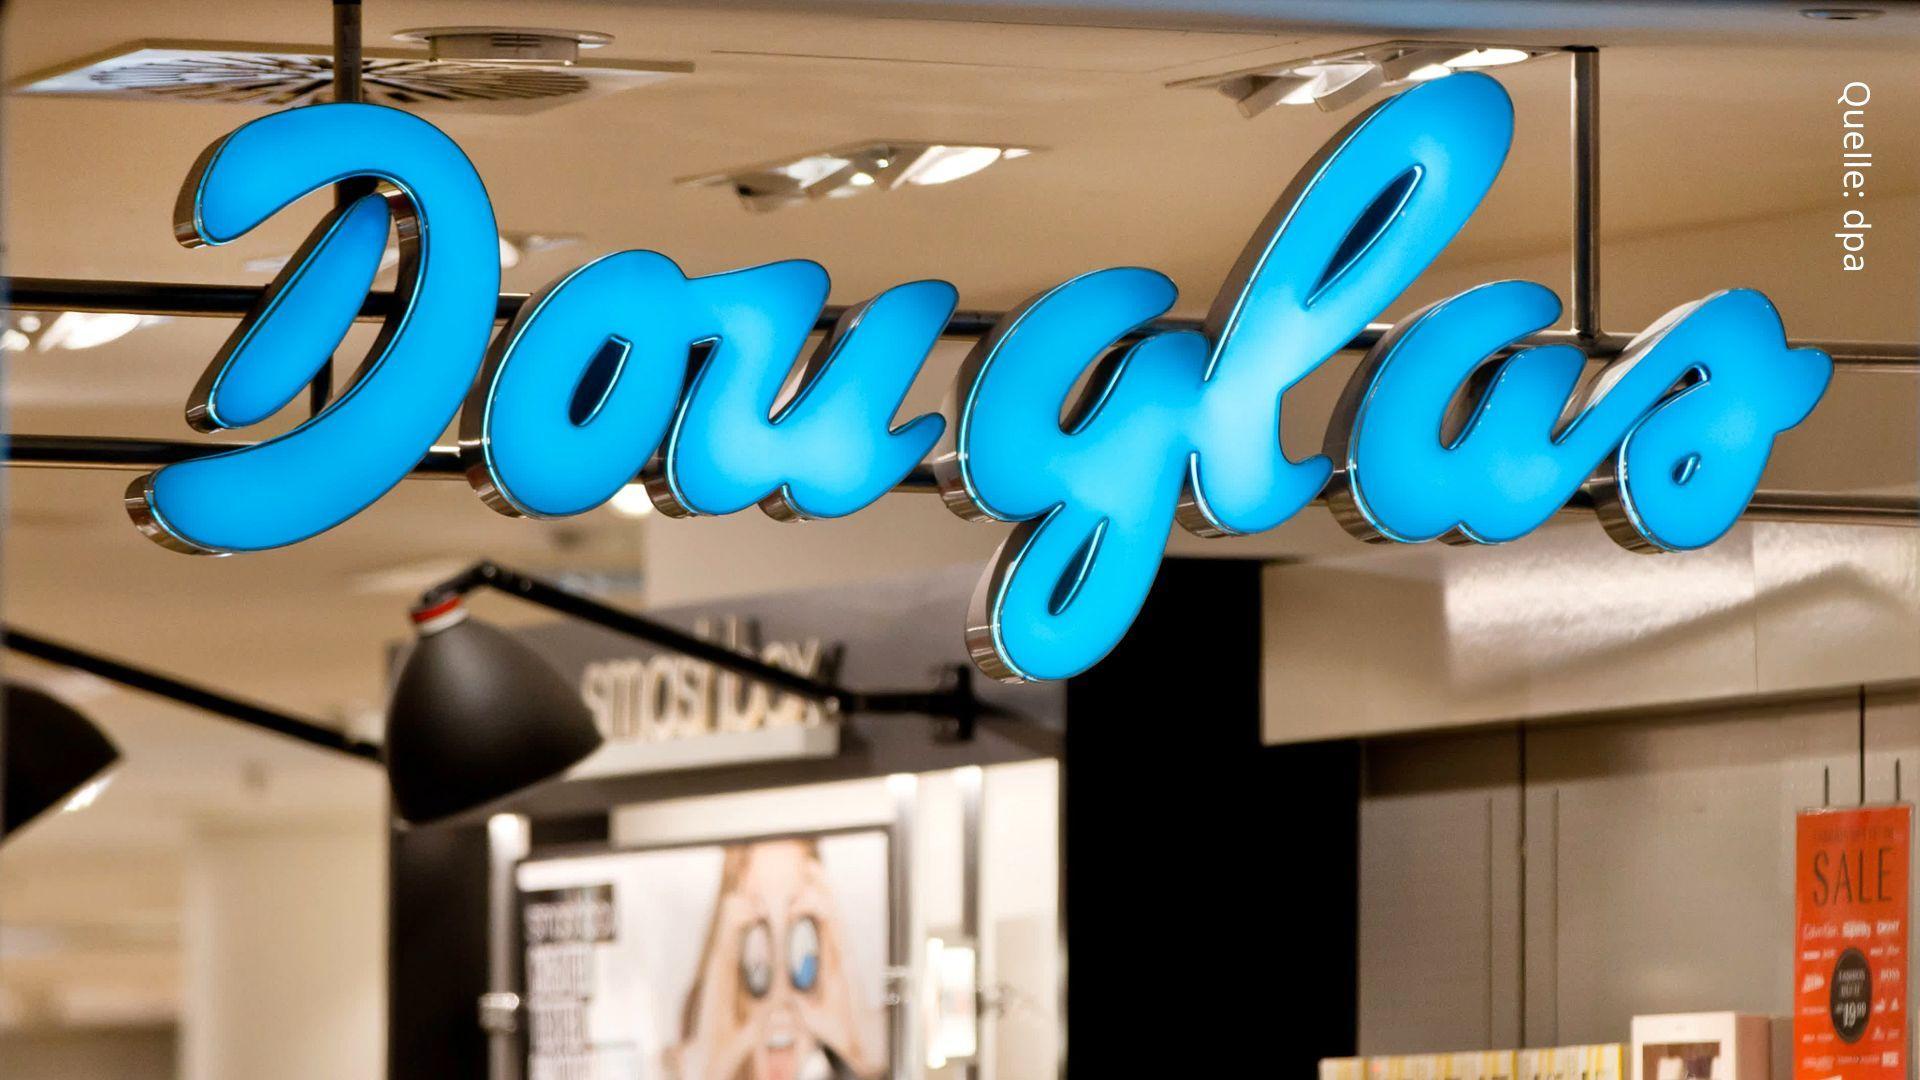 Douglas schließt Dutzende Filialen